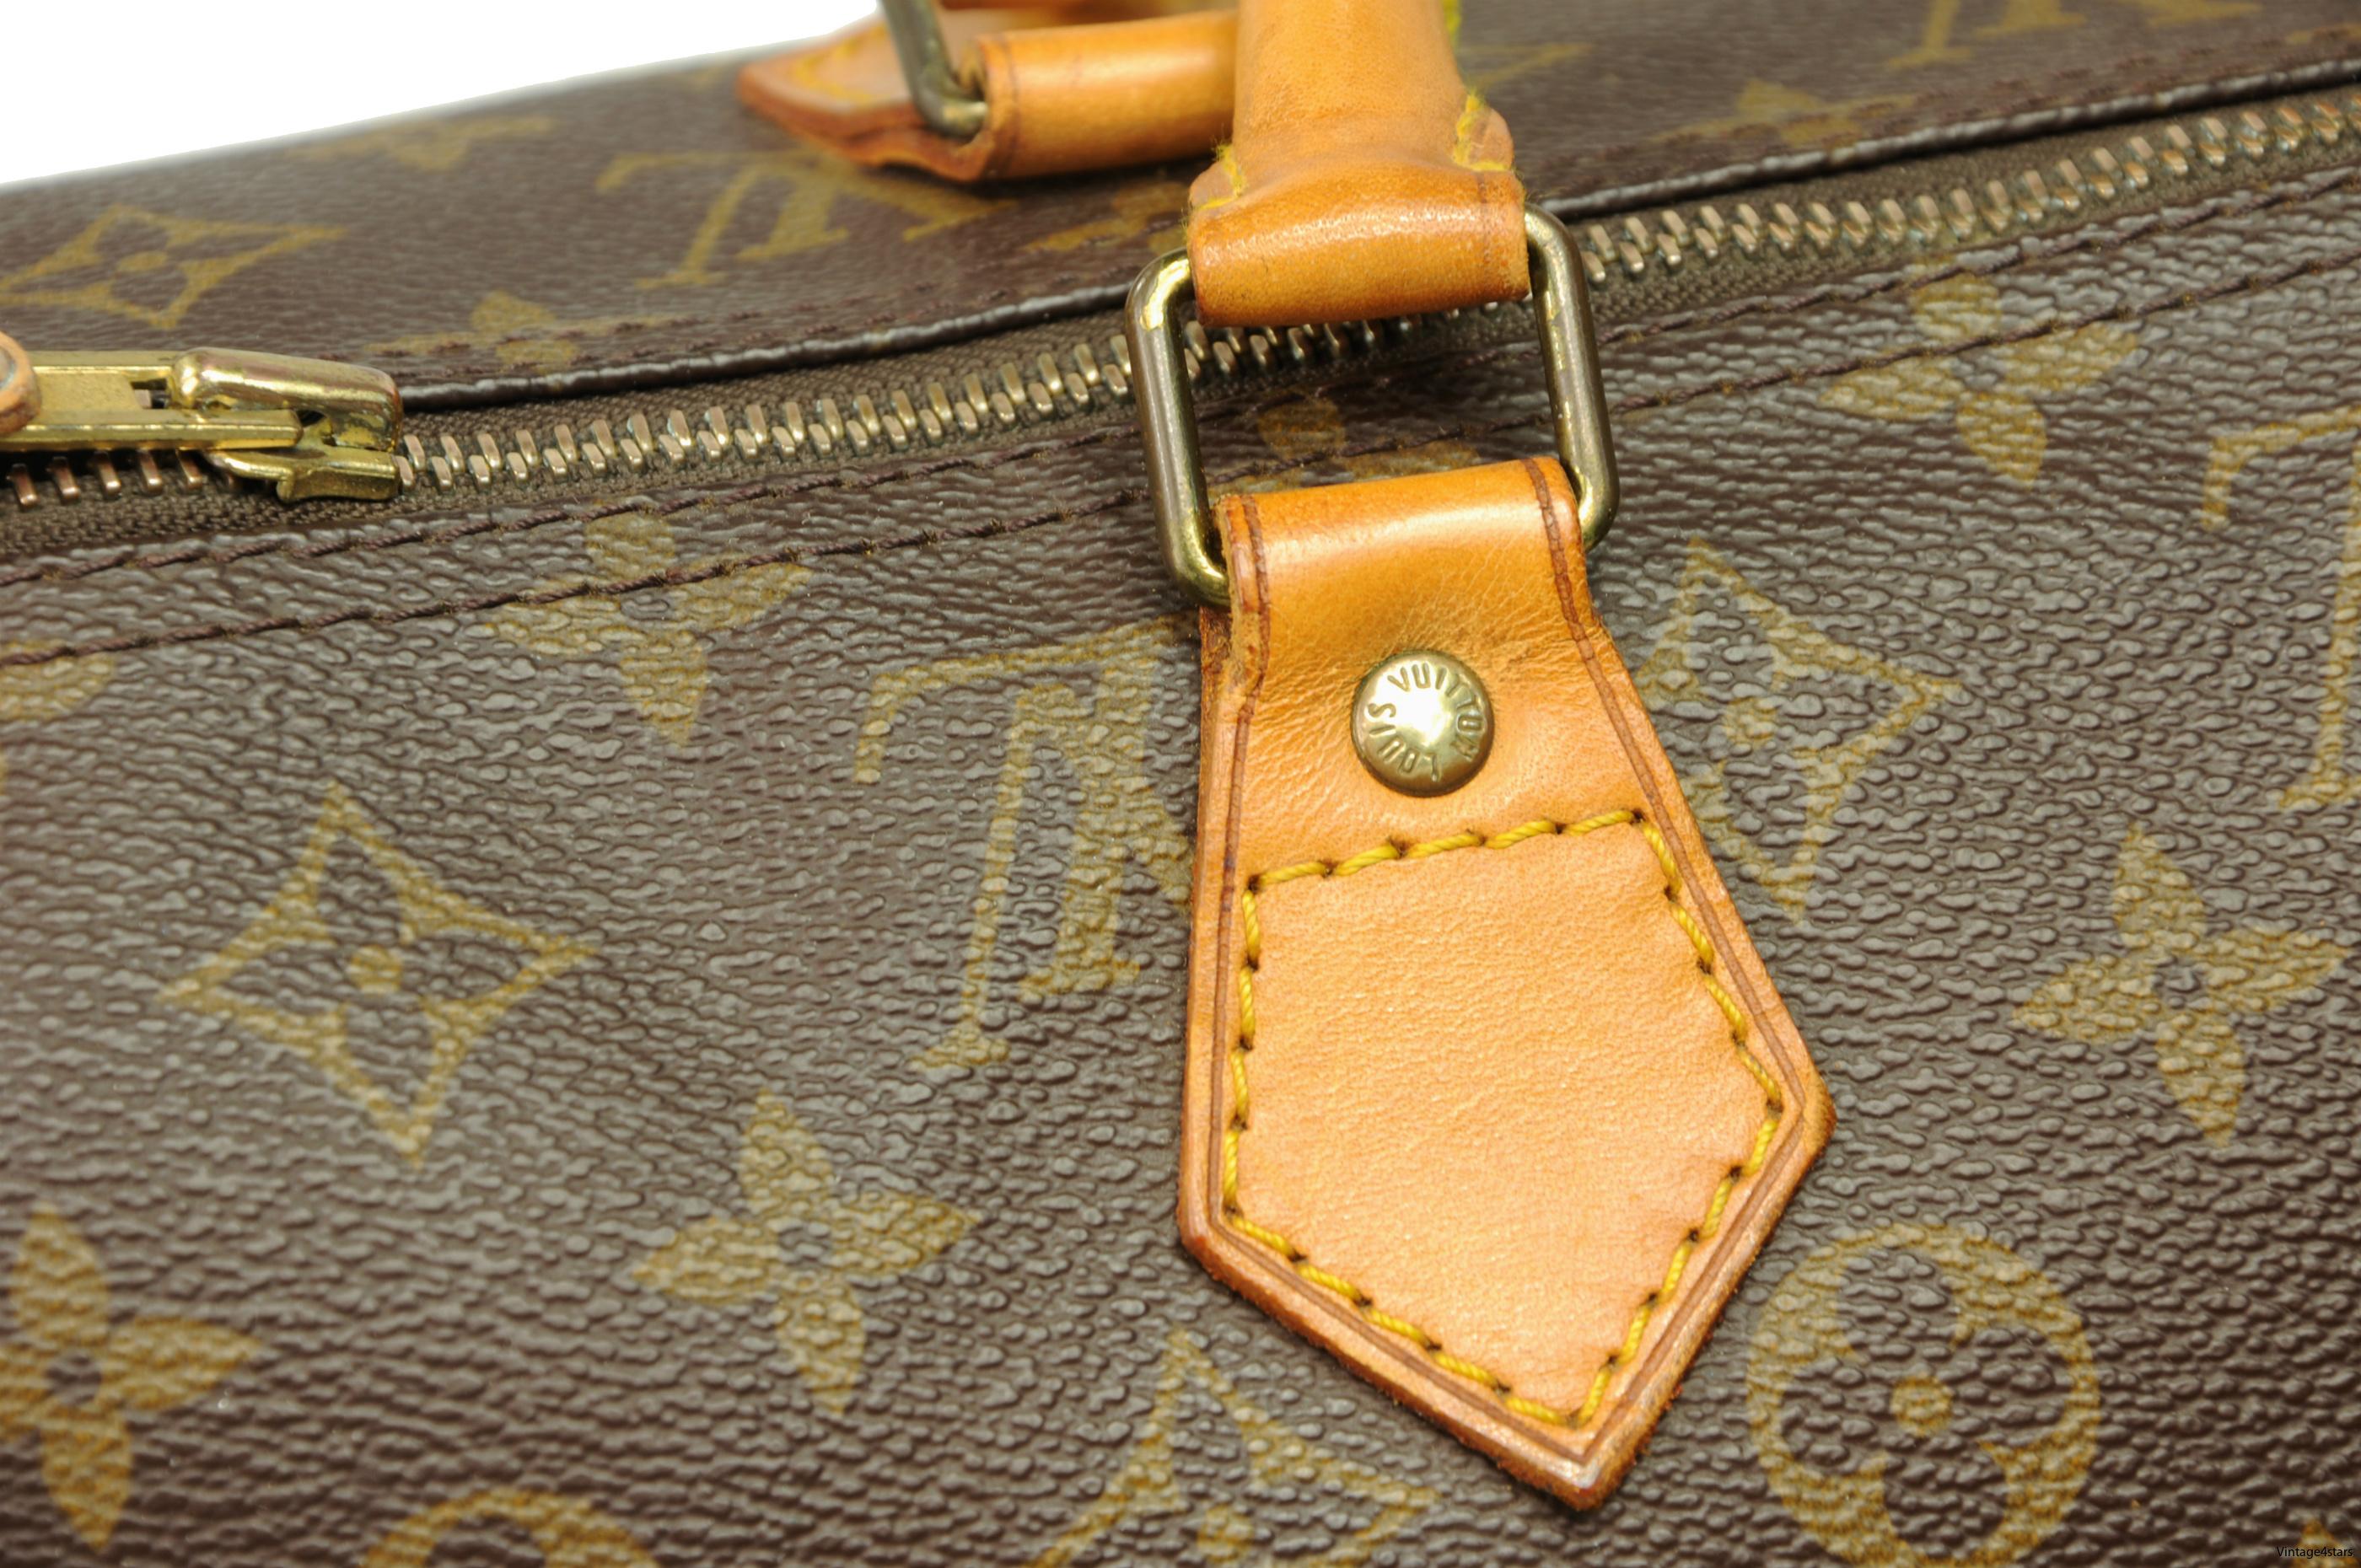 Louis Vuitton Speedy 40 Monogram 12